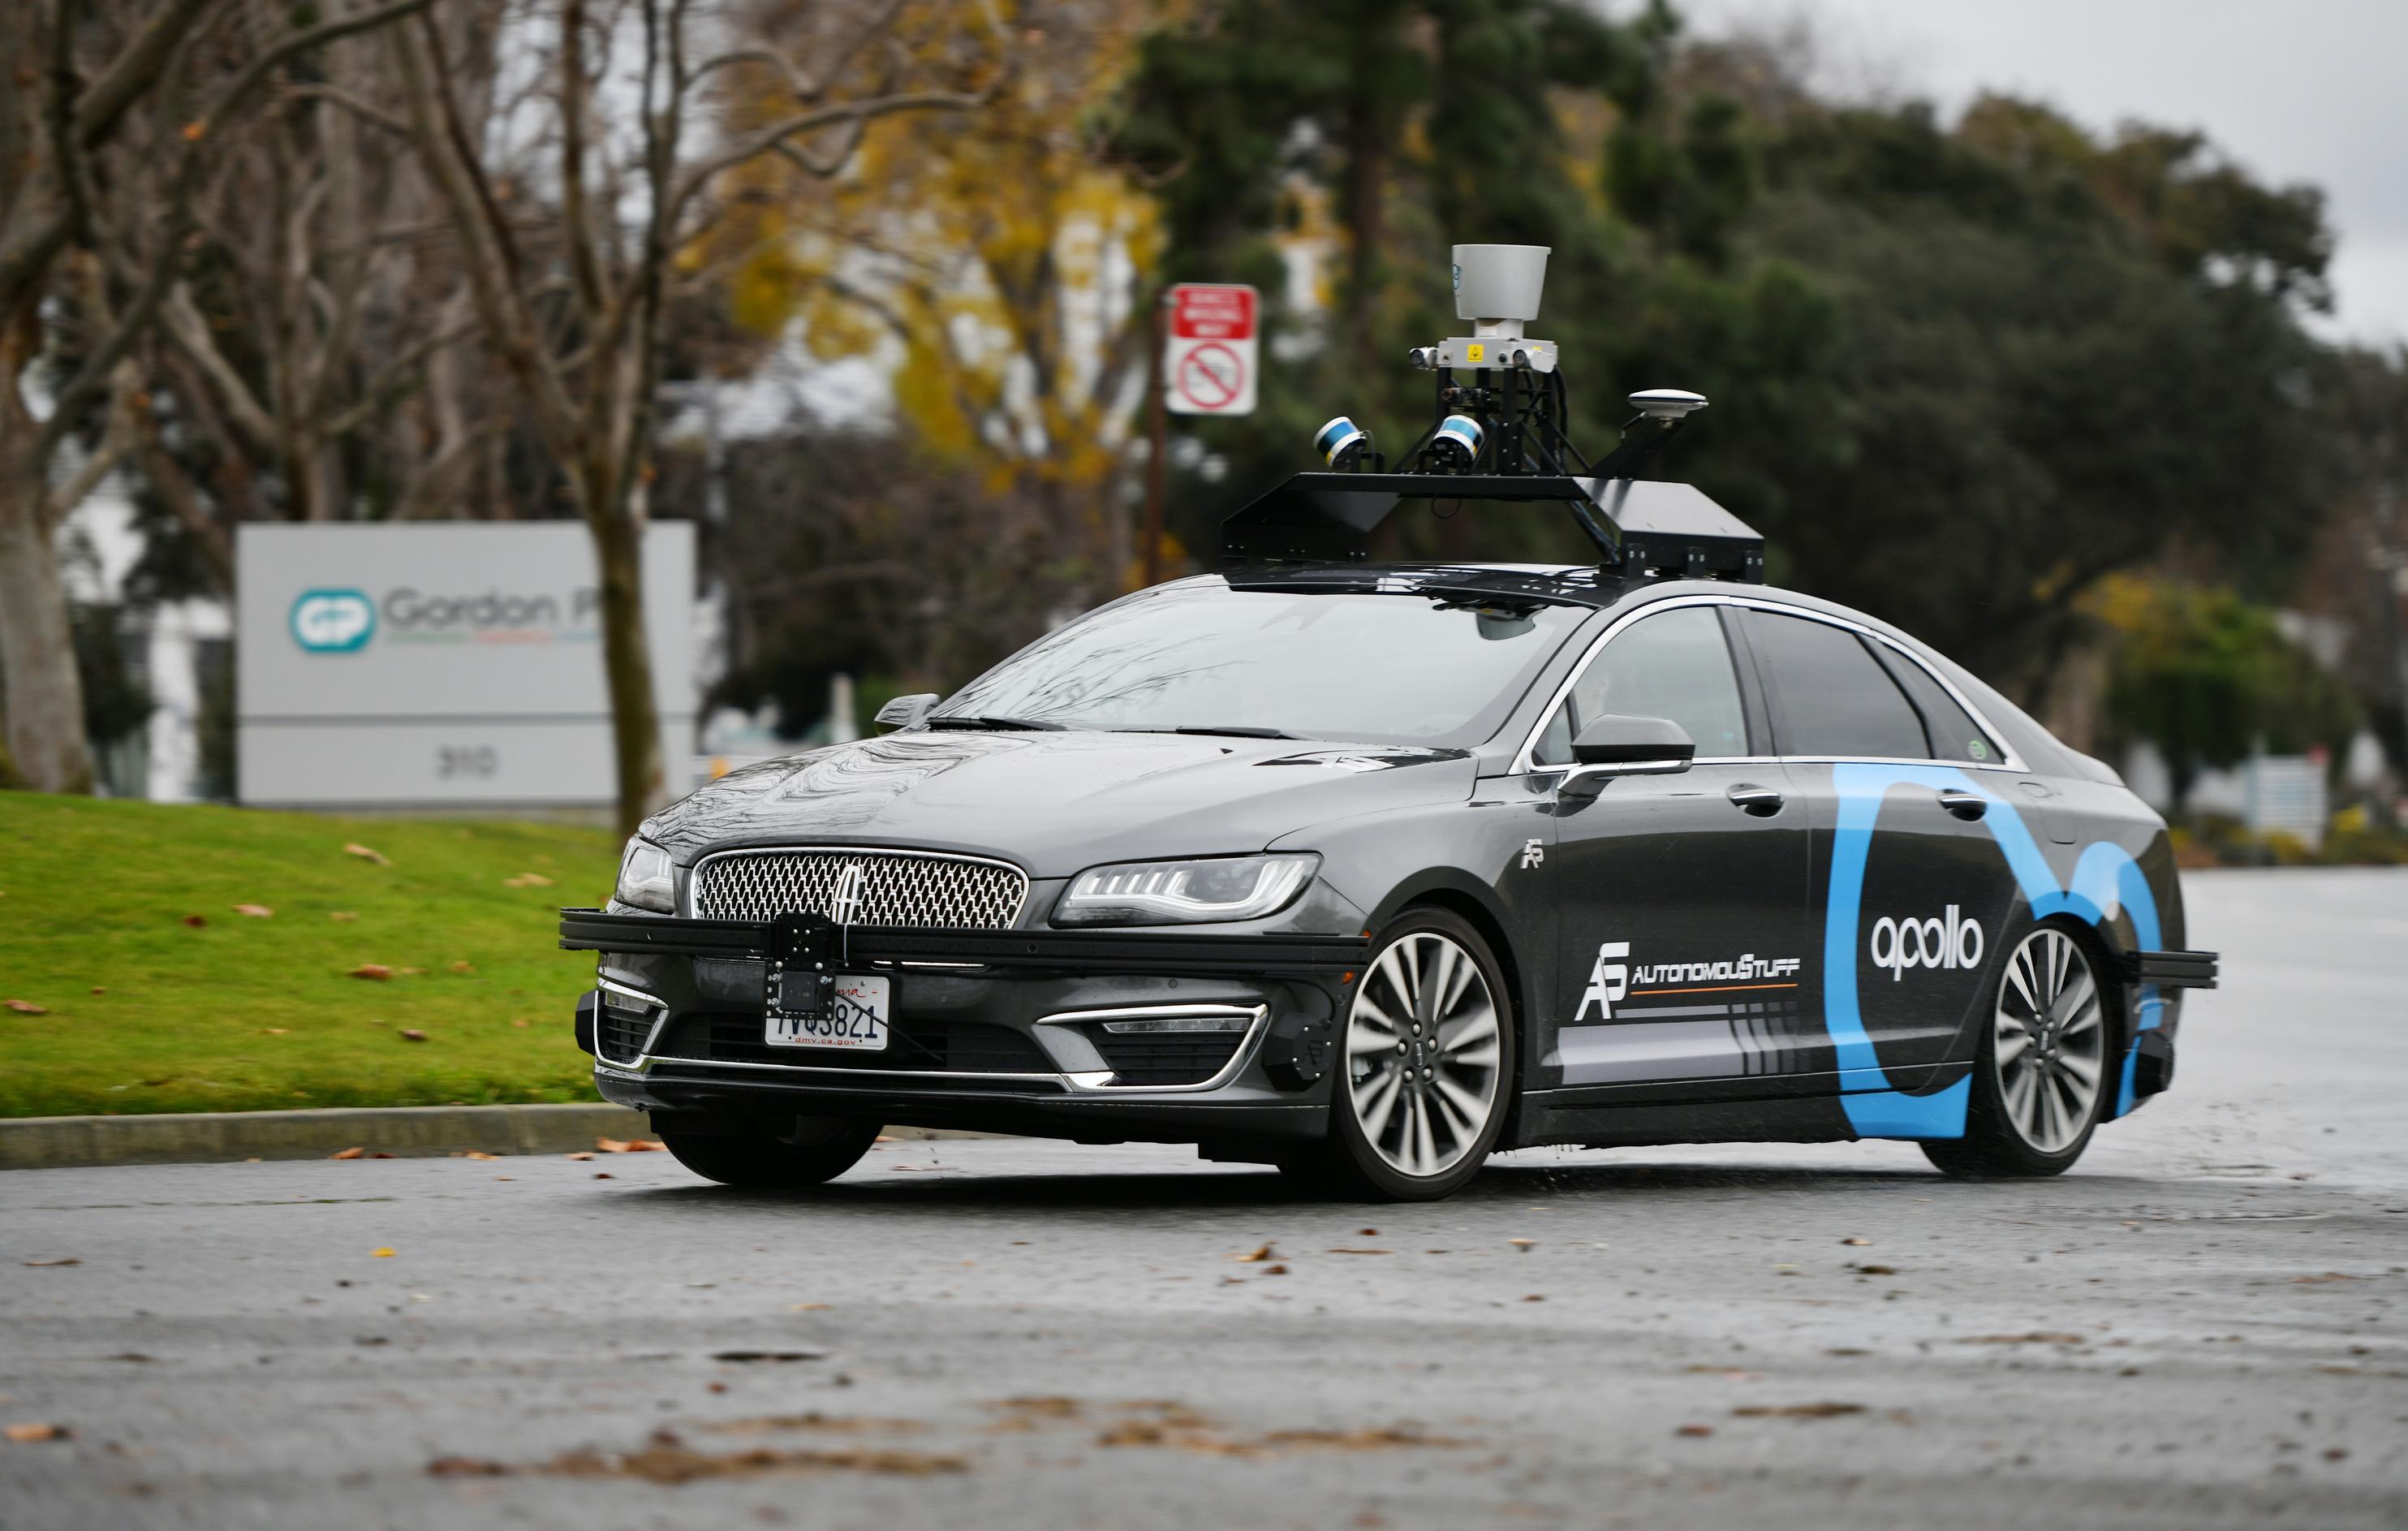 Baidu's Apollo self-driving car.